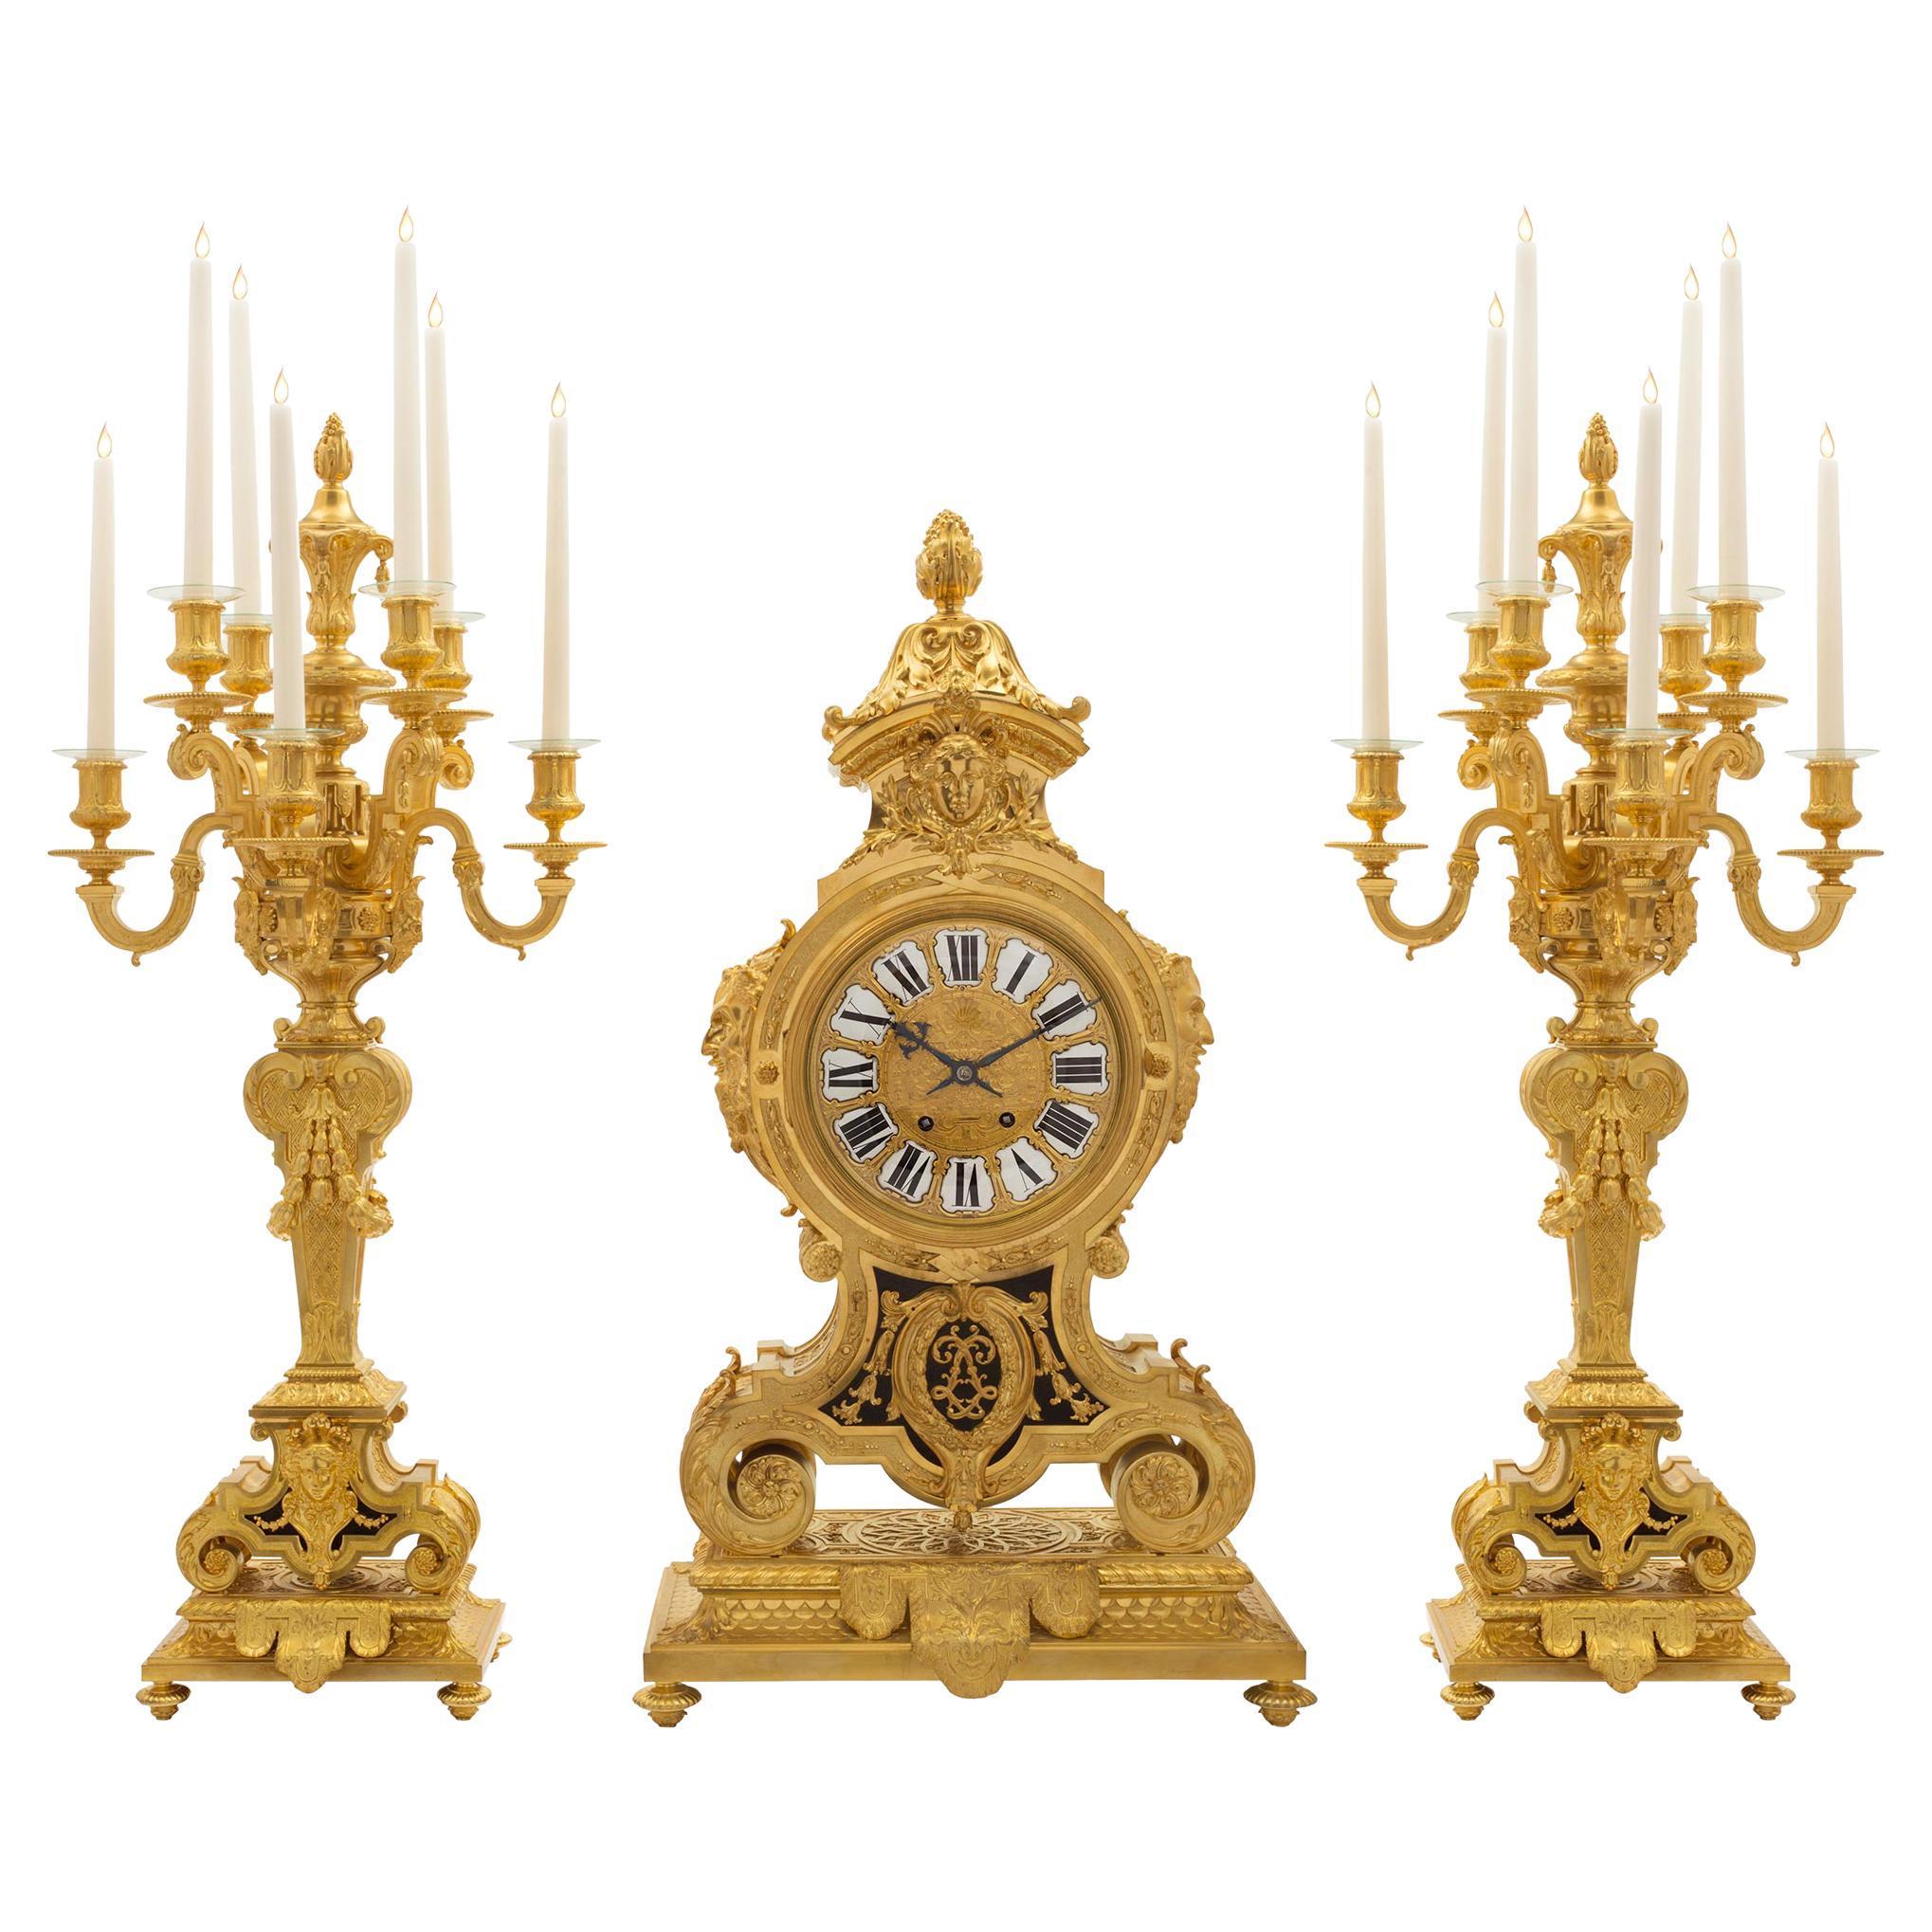 French Mid-19th Century Ormolu Three-Piece Garniture Clock Set